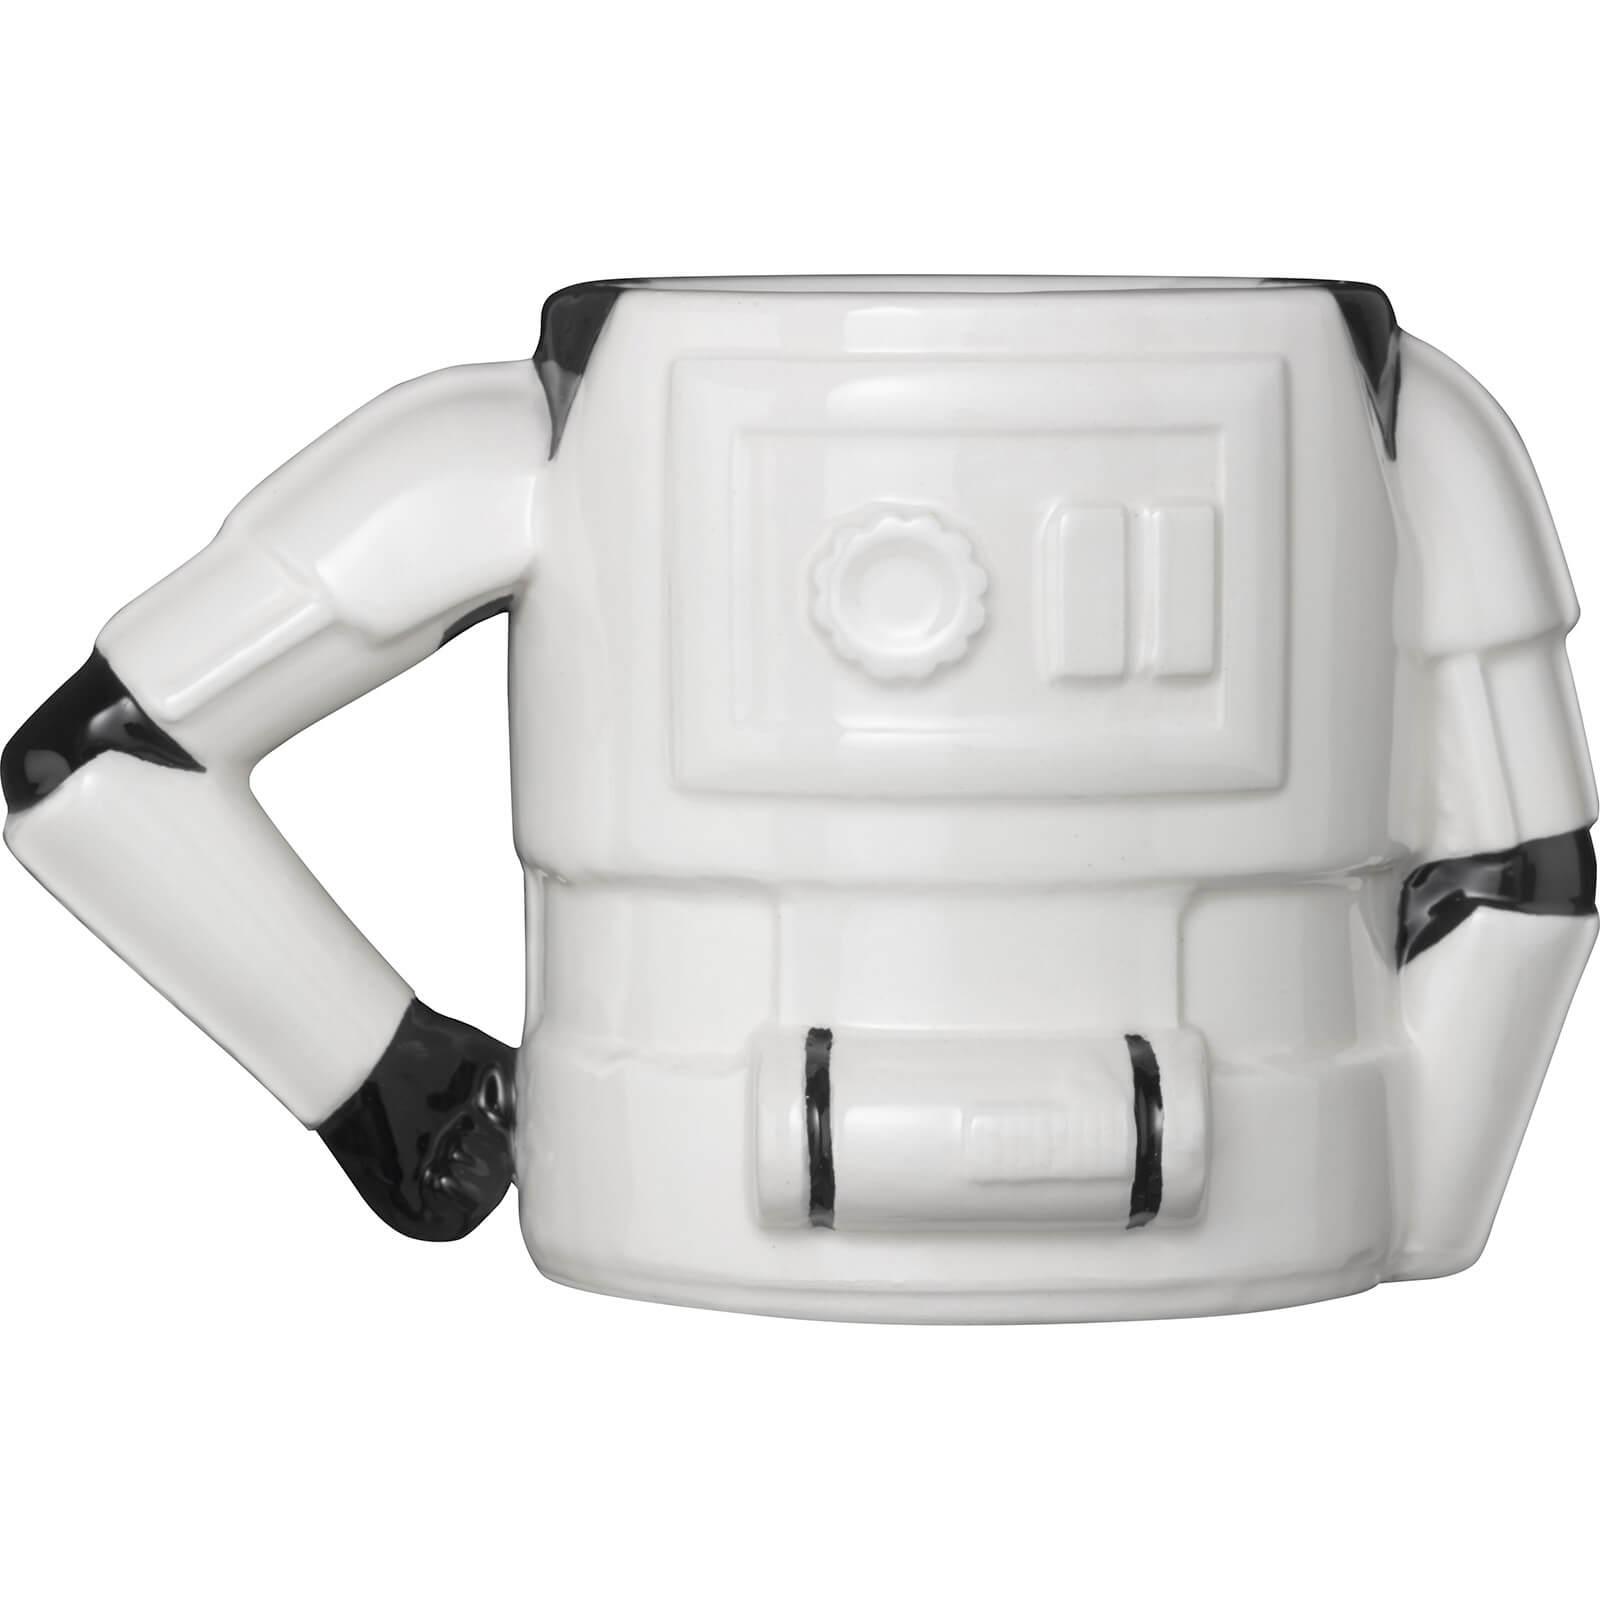 Image of Meta Merch Star Wars 3D Stormtrooper Arm Mug